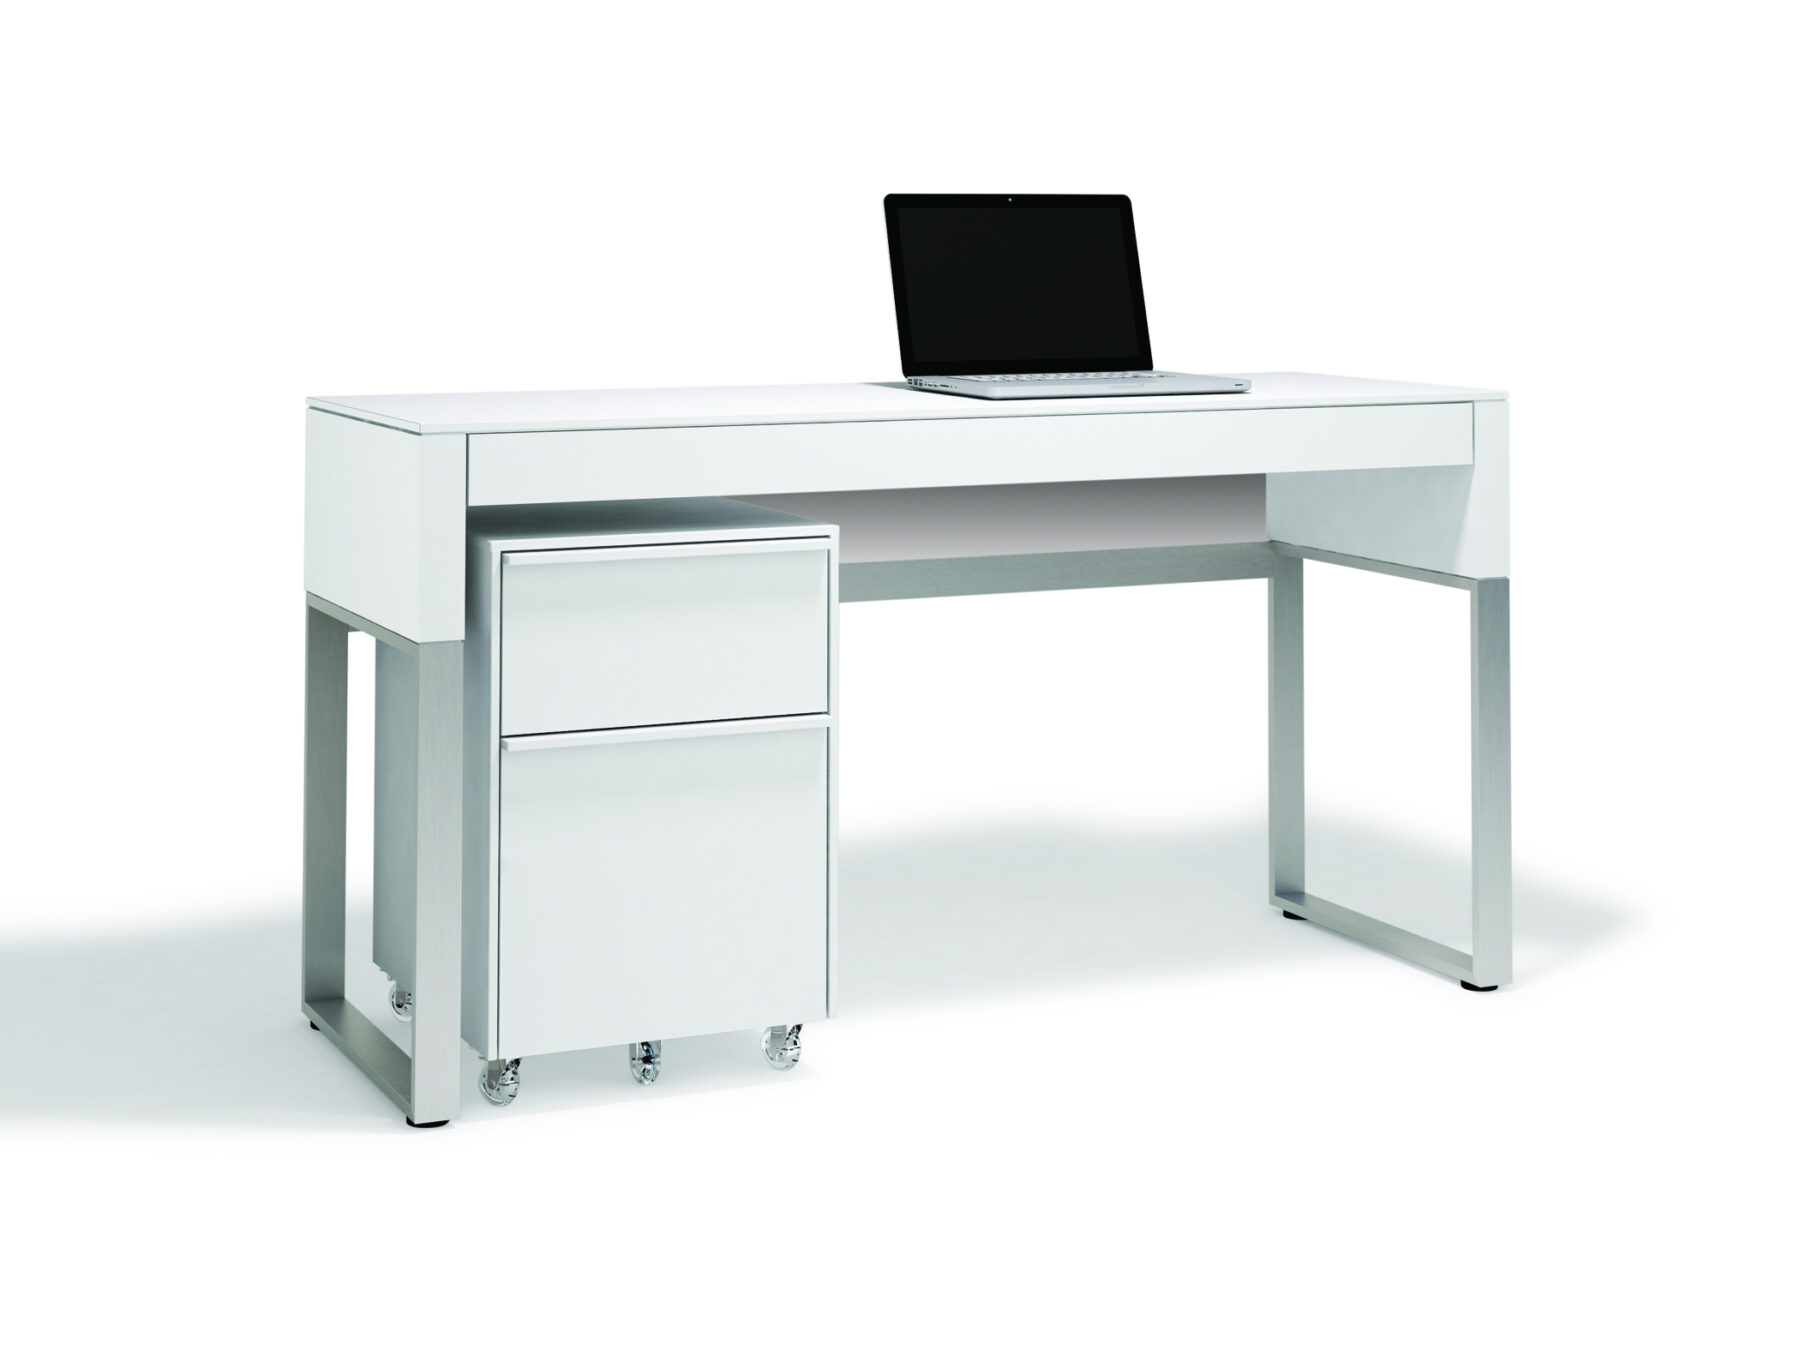 cascadia-6202-6207-white-bdi-modern-office-1